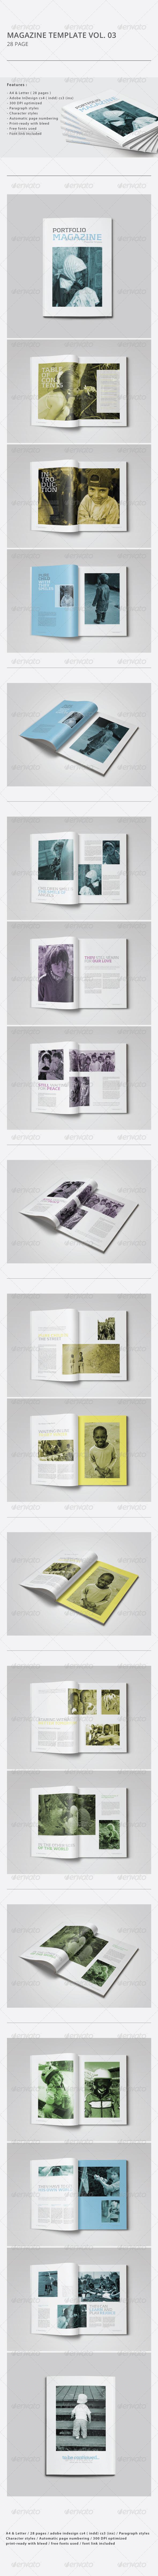 GraphicRiver Indesign Magazine Template Vol.03 8547194